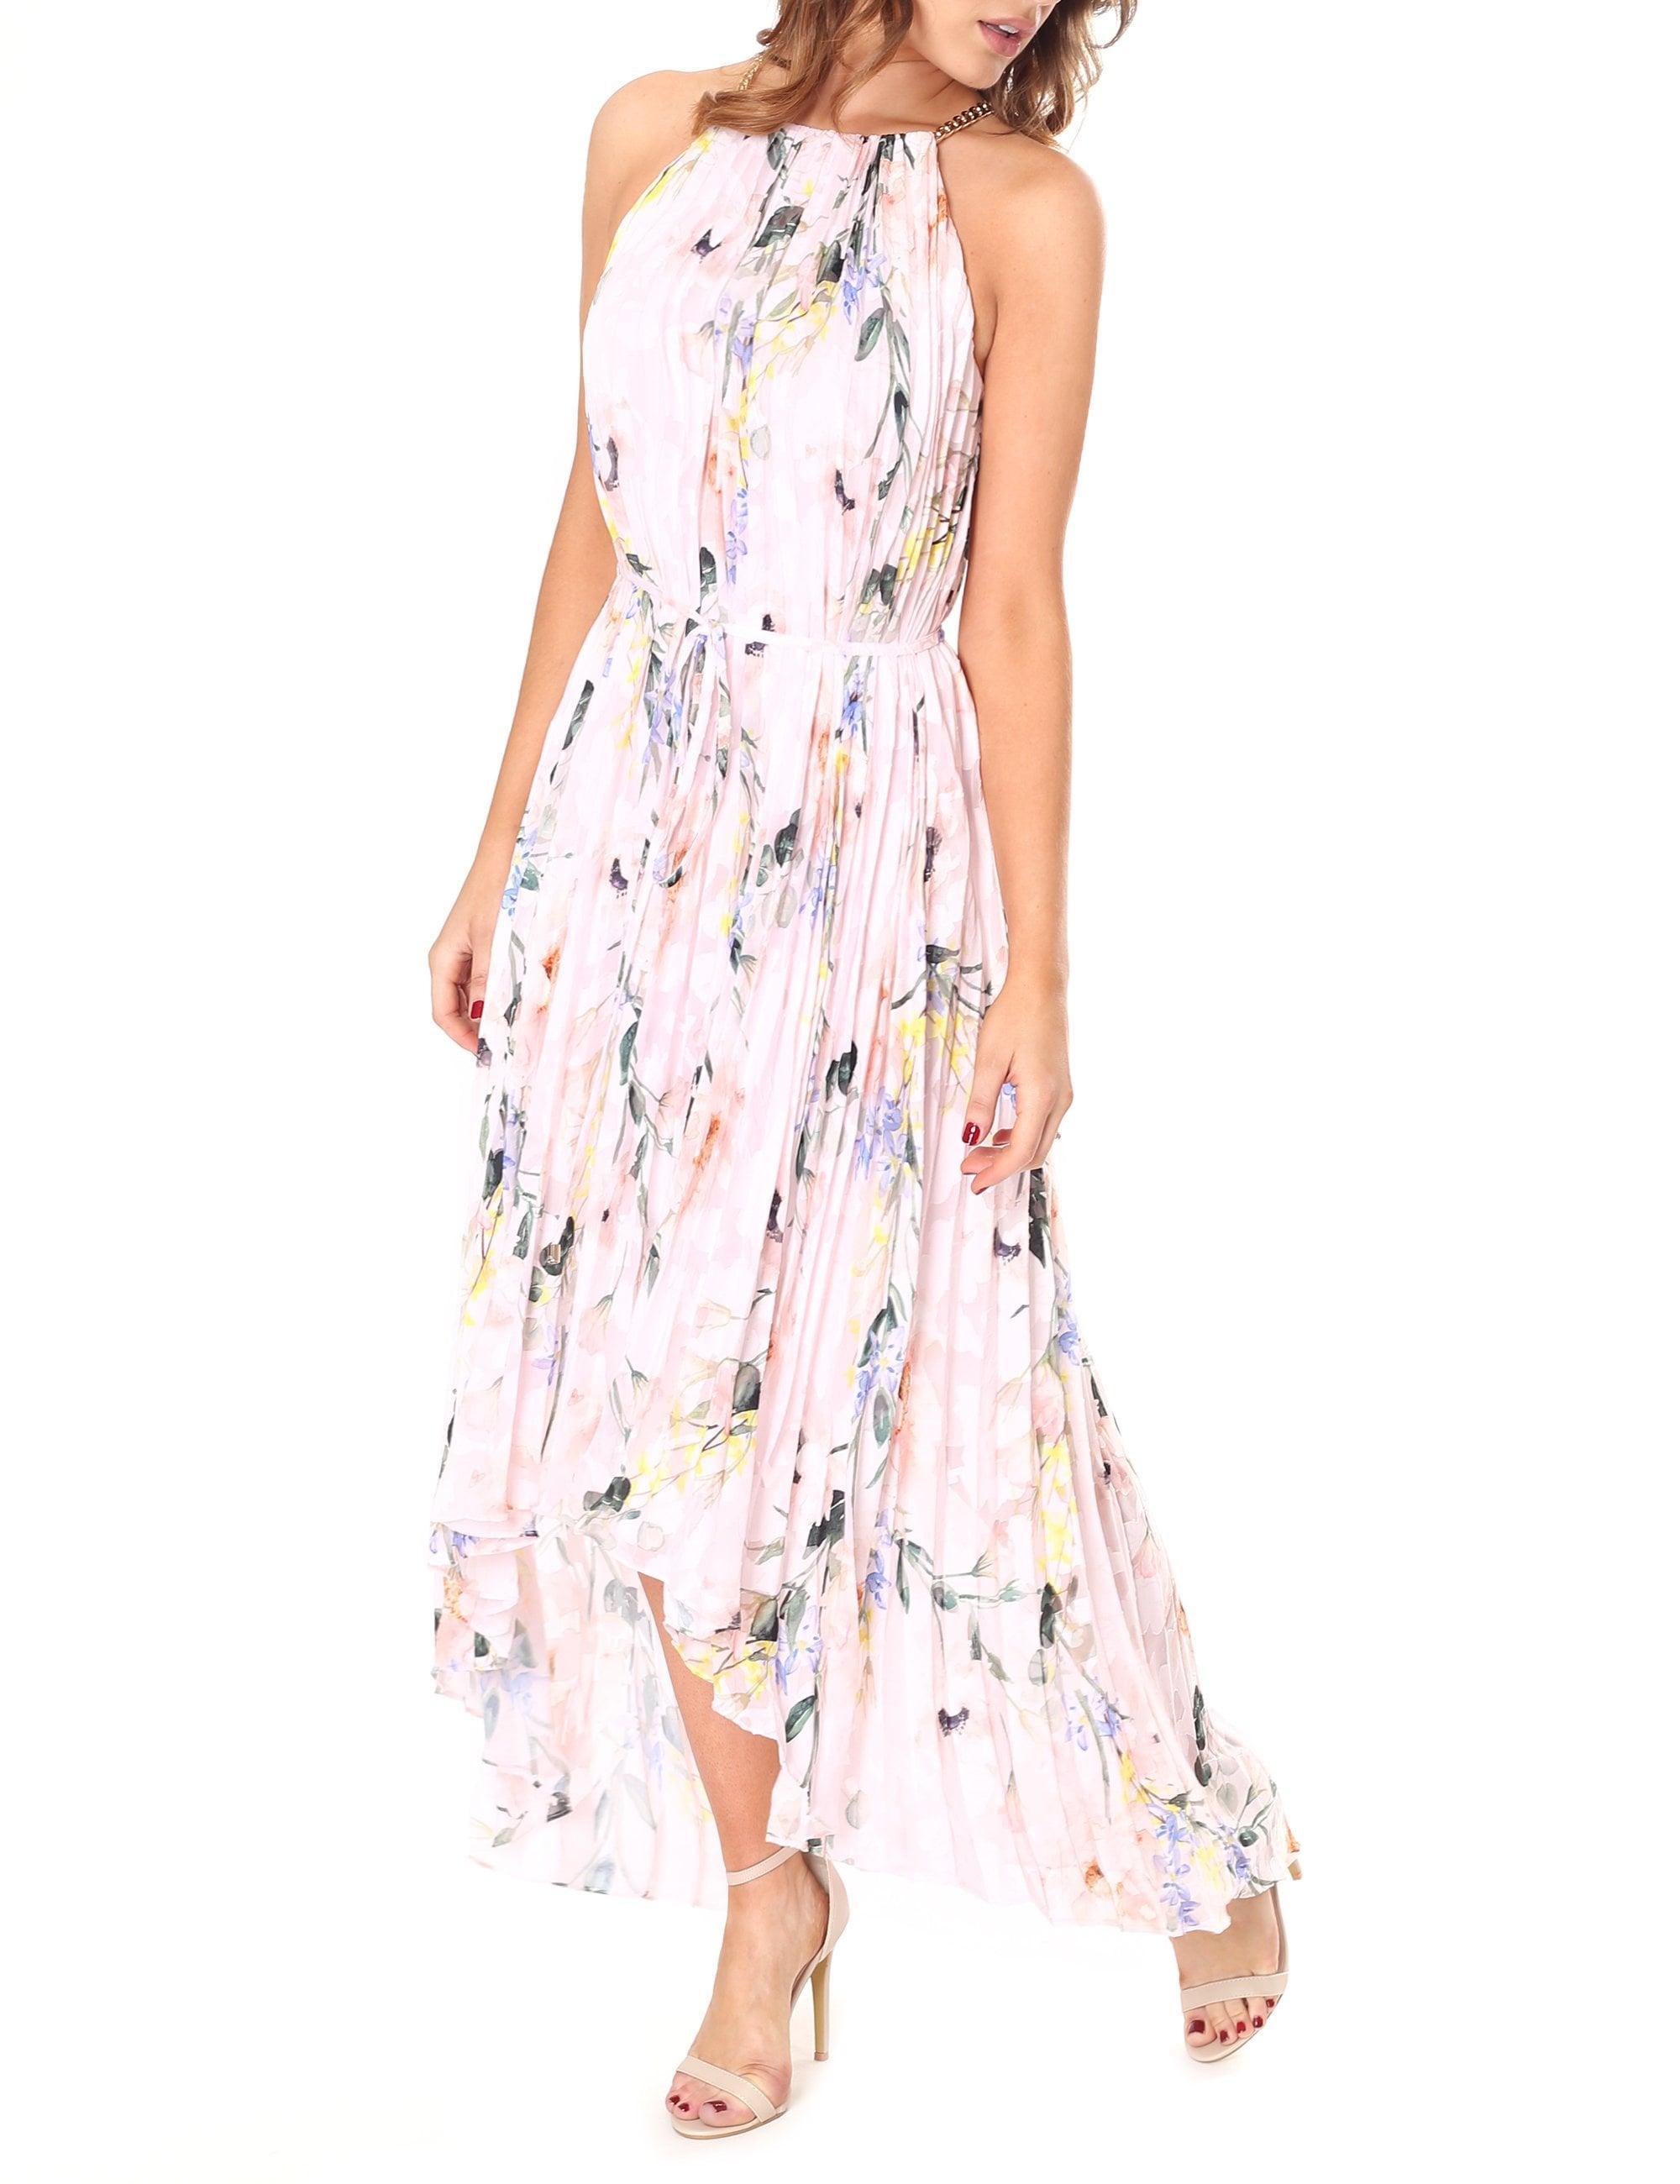 c428994b8 Ted Baker Valetia Elegance Pleat Dip Hem Dress in Pink - Lyst